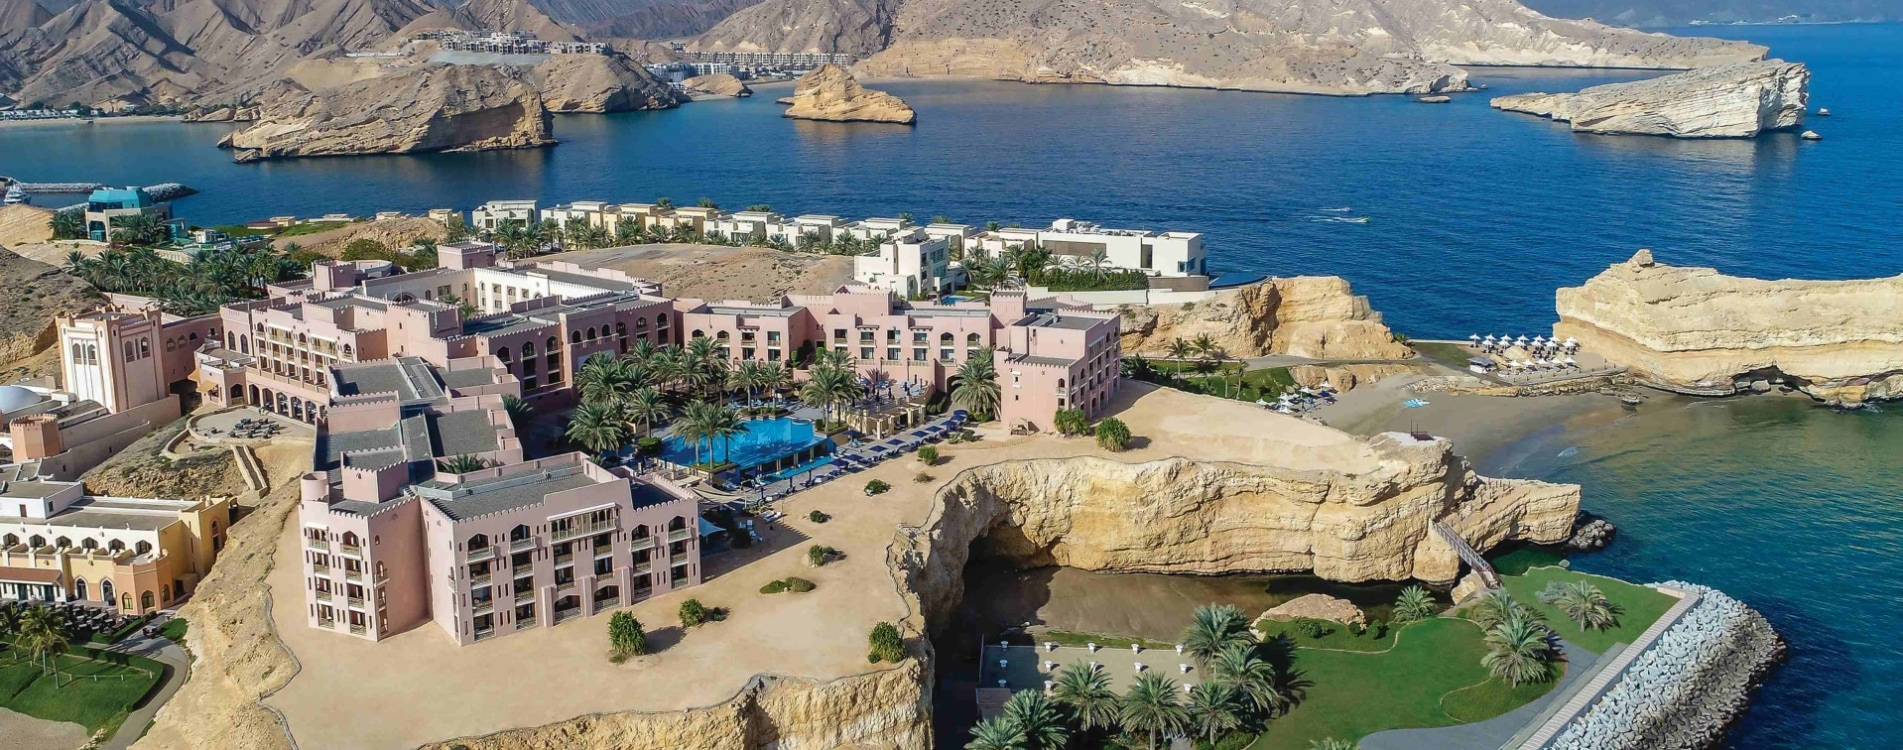 Shangri-La-Al-Husn-Resort-and-Spa-Panorama-Hotelanalage-Luftbildaufnahme-Oman.jpg